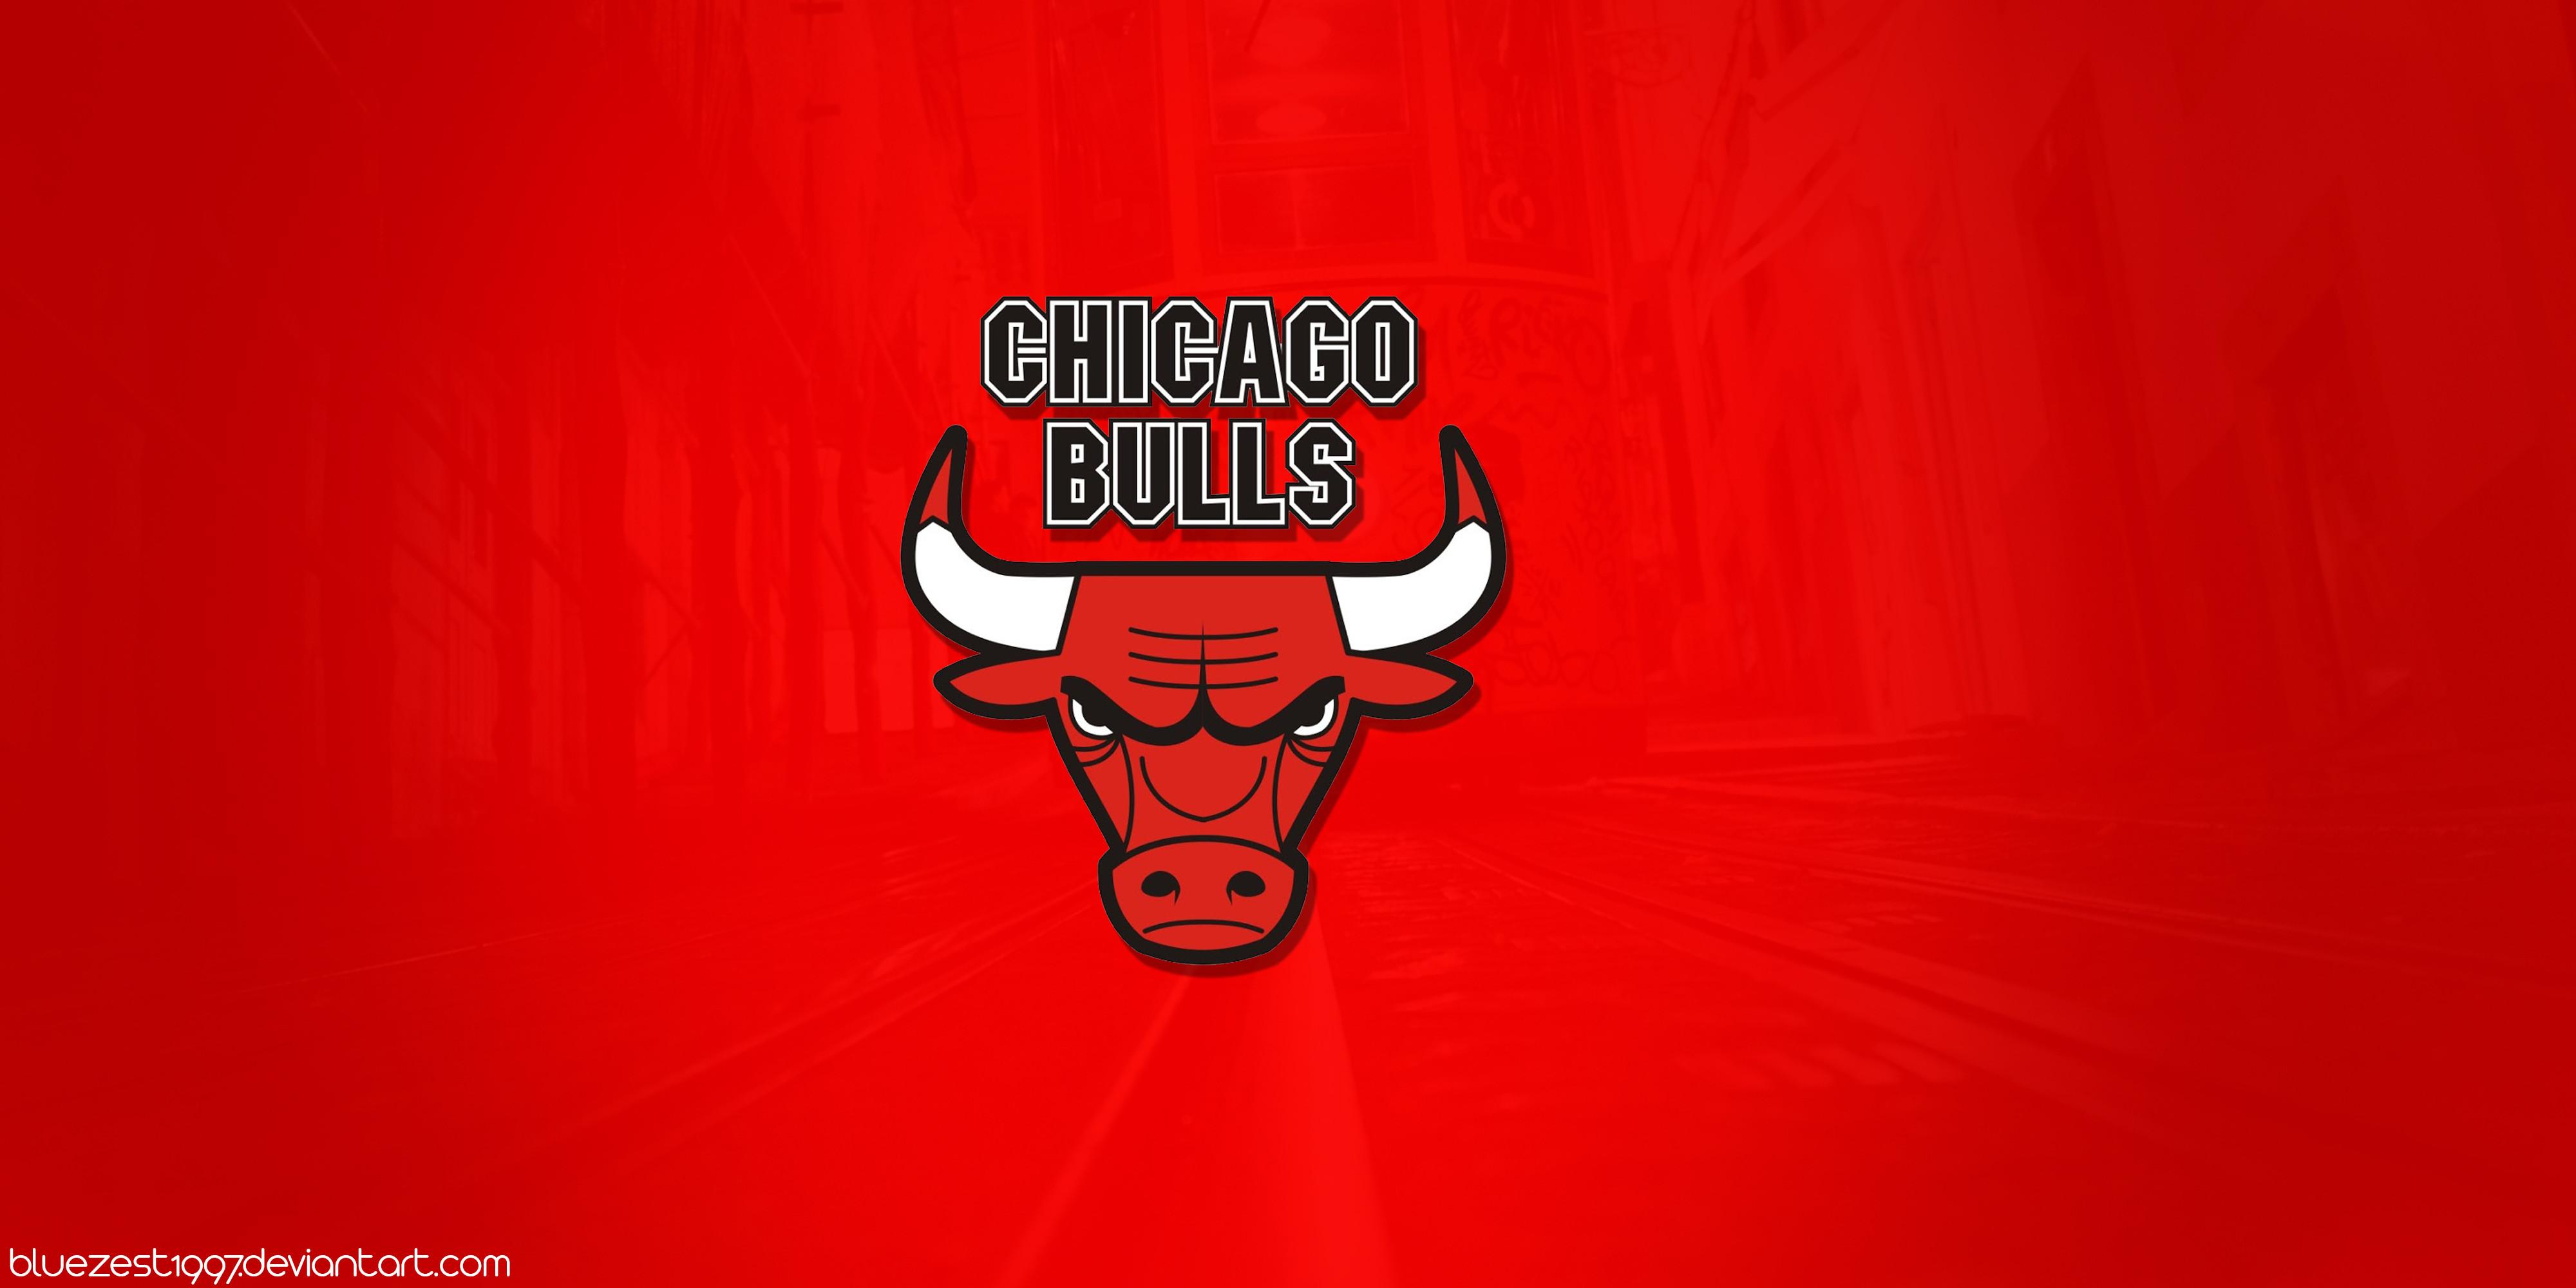 Chicago Bulls Logo Wallpaper Hd on WallpaperGet.com.